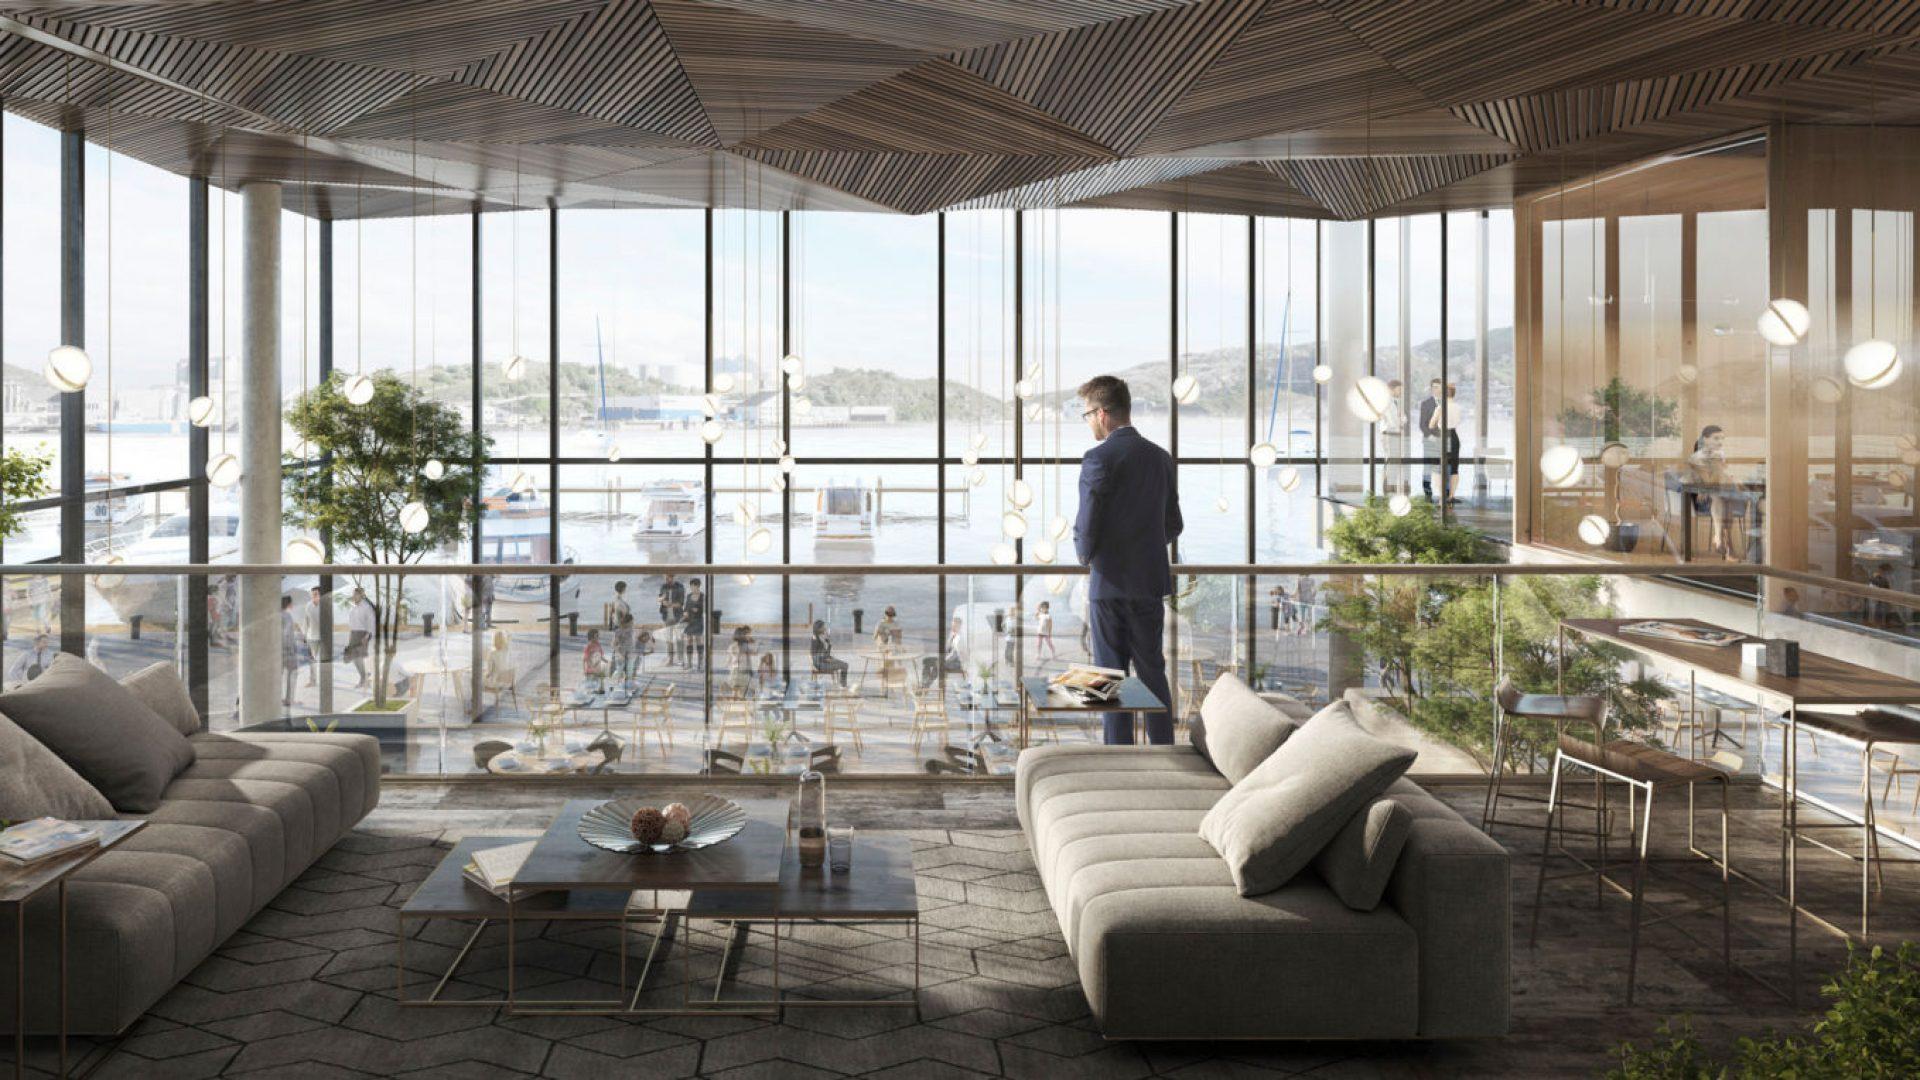 40008_Quality_Hotell_Bod_Nordic_Brick_Visual_N4_devsize_8dc26ff132f44ce96291c13c61855fa4